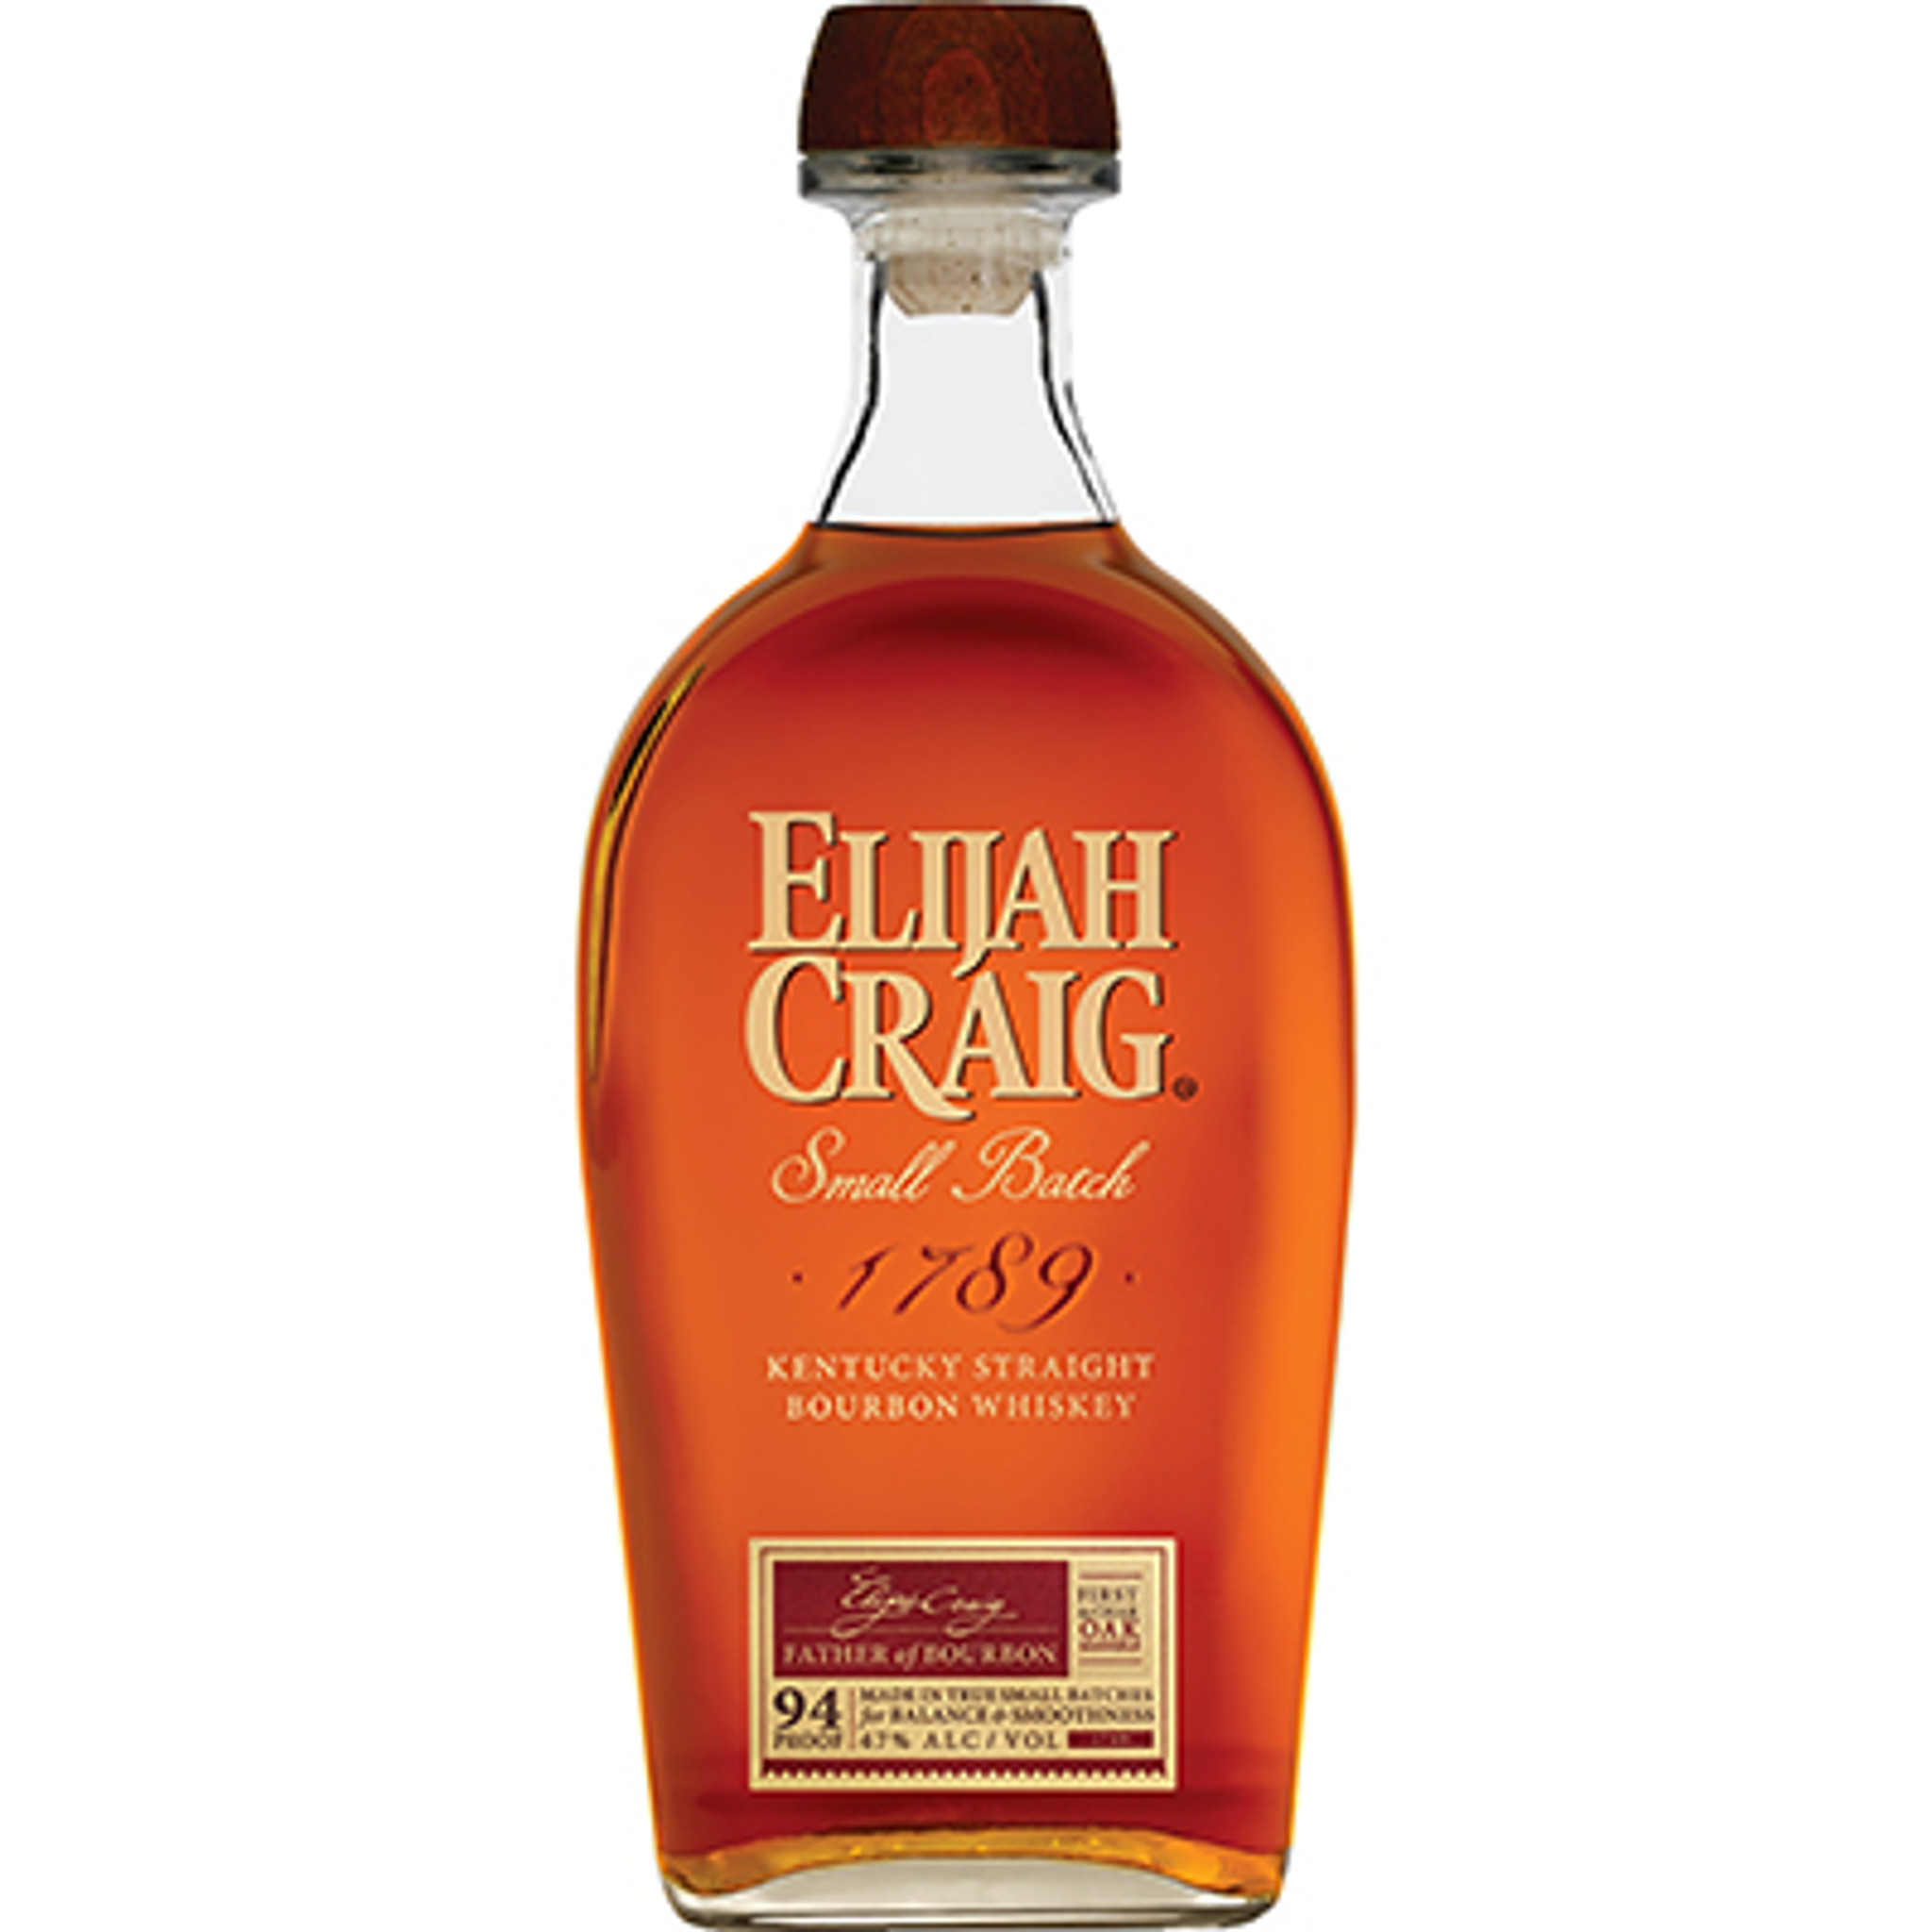 Lækker Elijah Craig Small Batch Kentucky Straight Bourbon Whiskey 94 QU-31